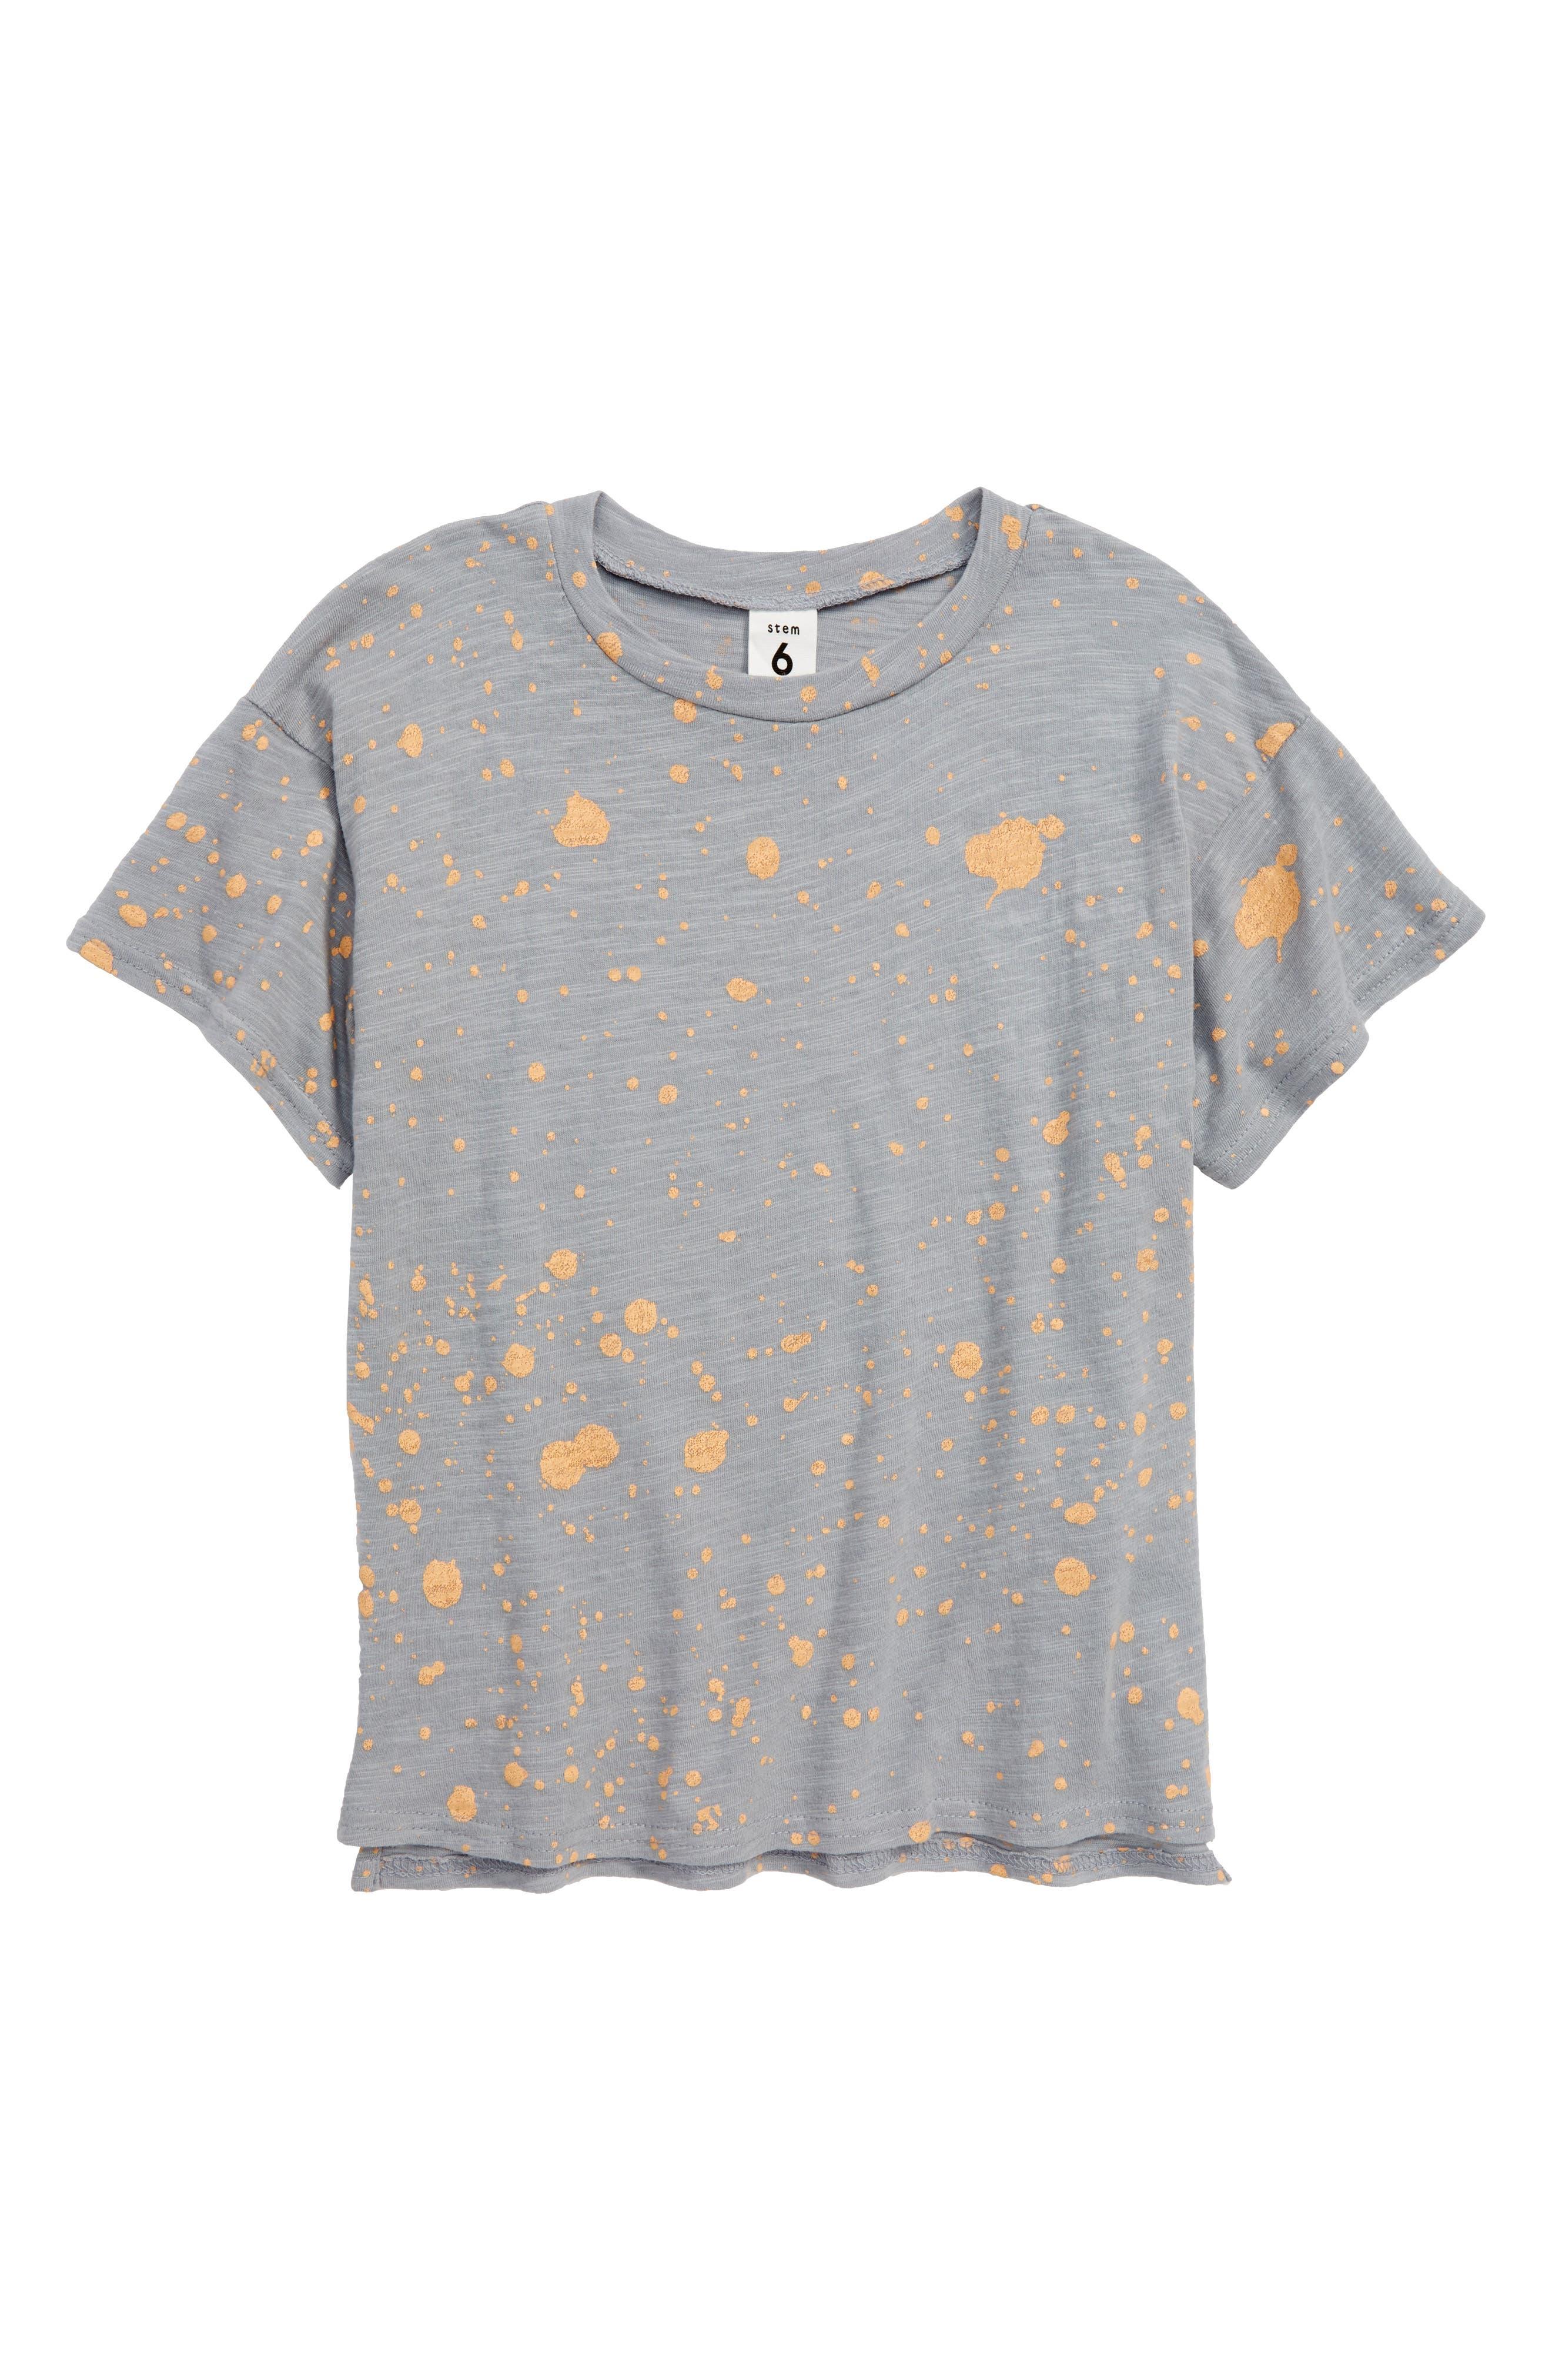 Print T-Shirt,                             Main thumbnail 1, color,                             Grey Sleet- Orange Splatter